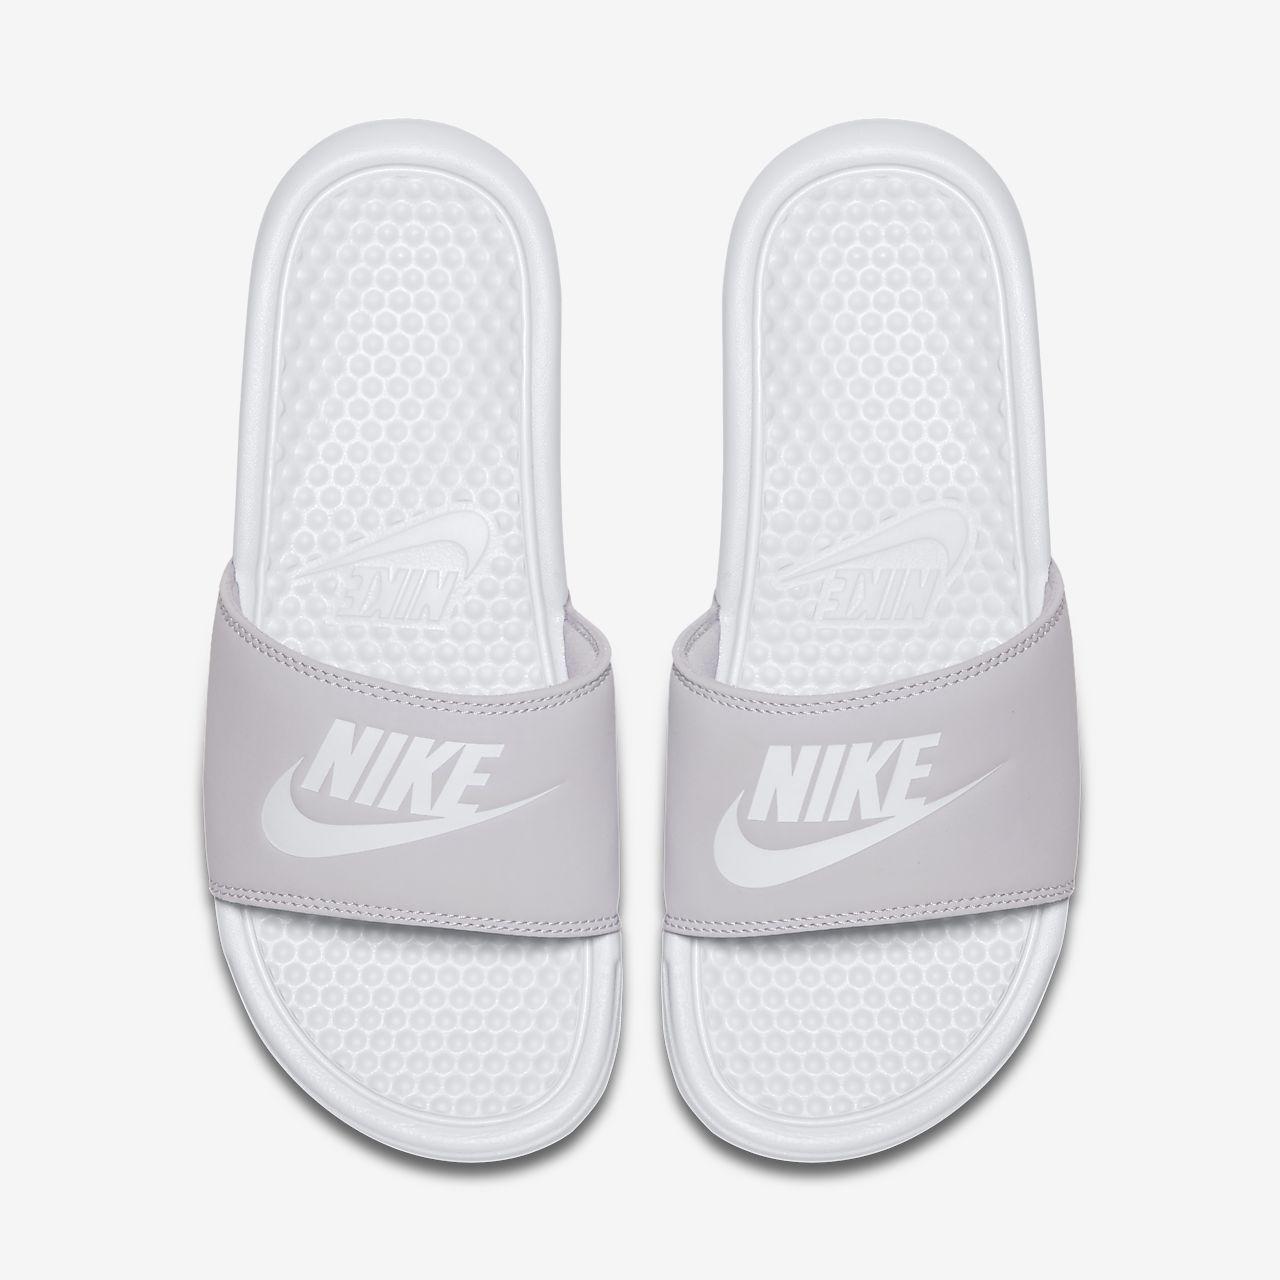 1f1d3bae1ba Claquette Nike Benassi Pastel QS pour Femme. Nike.com CA